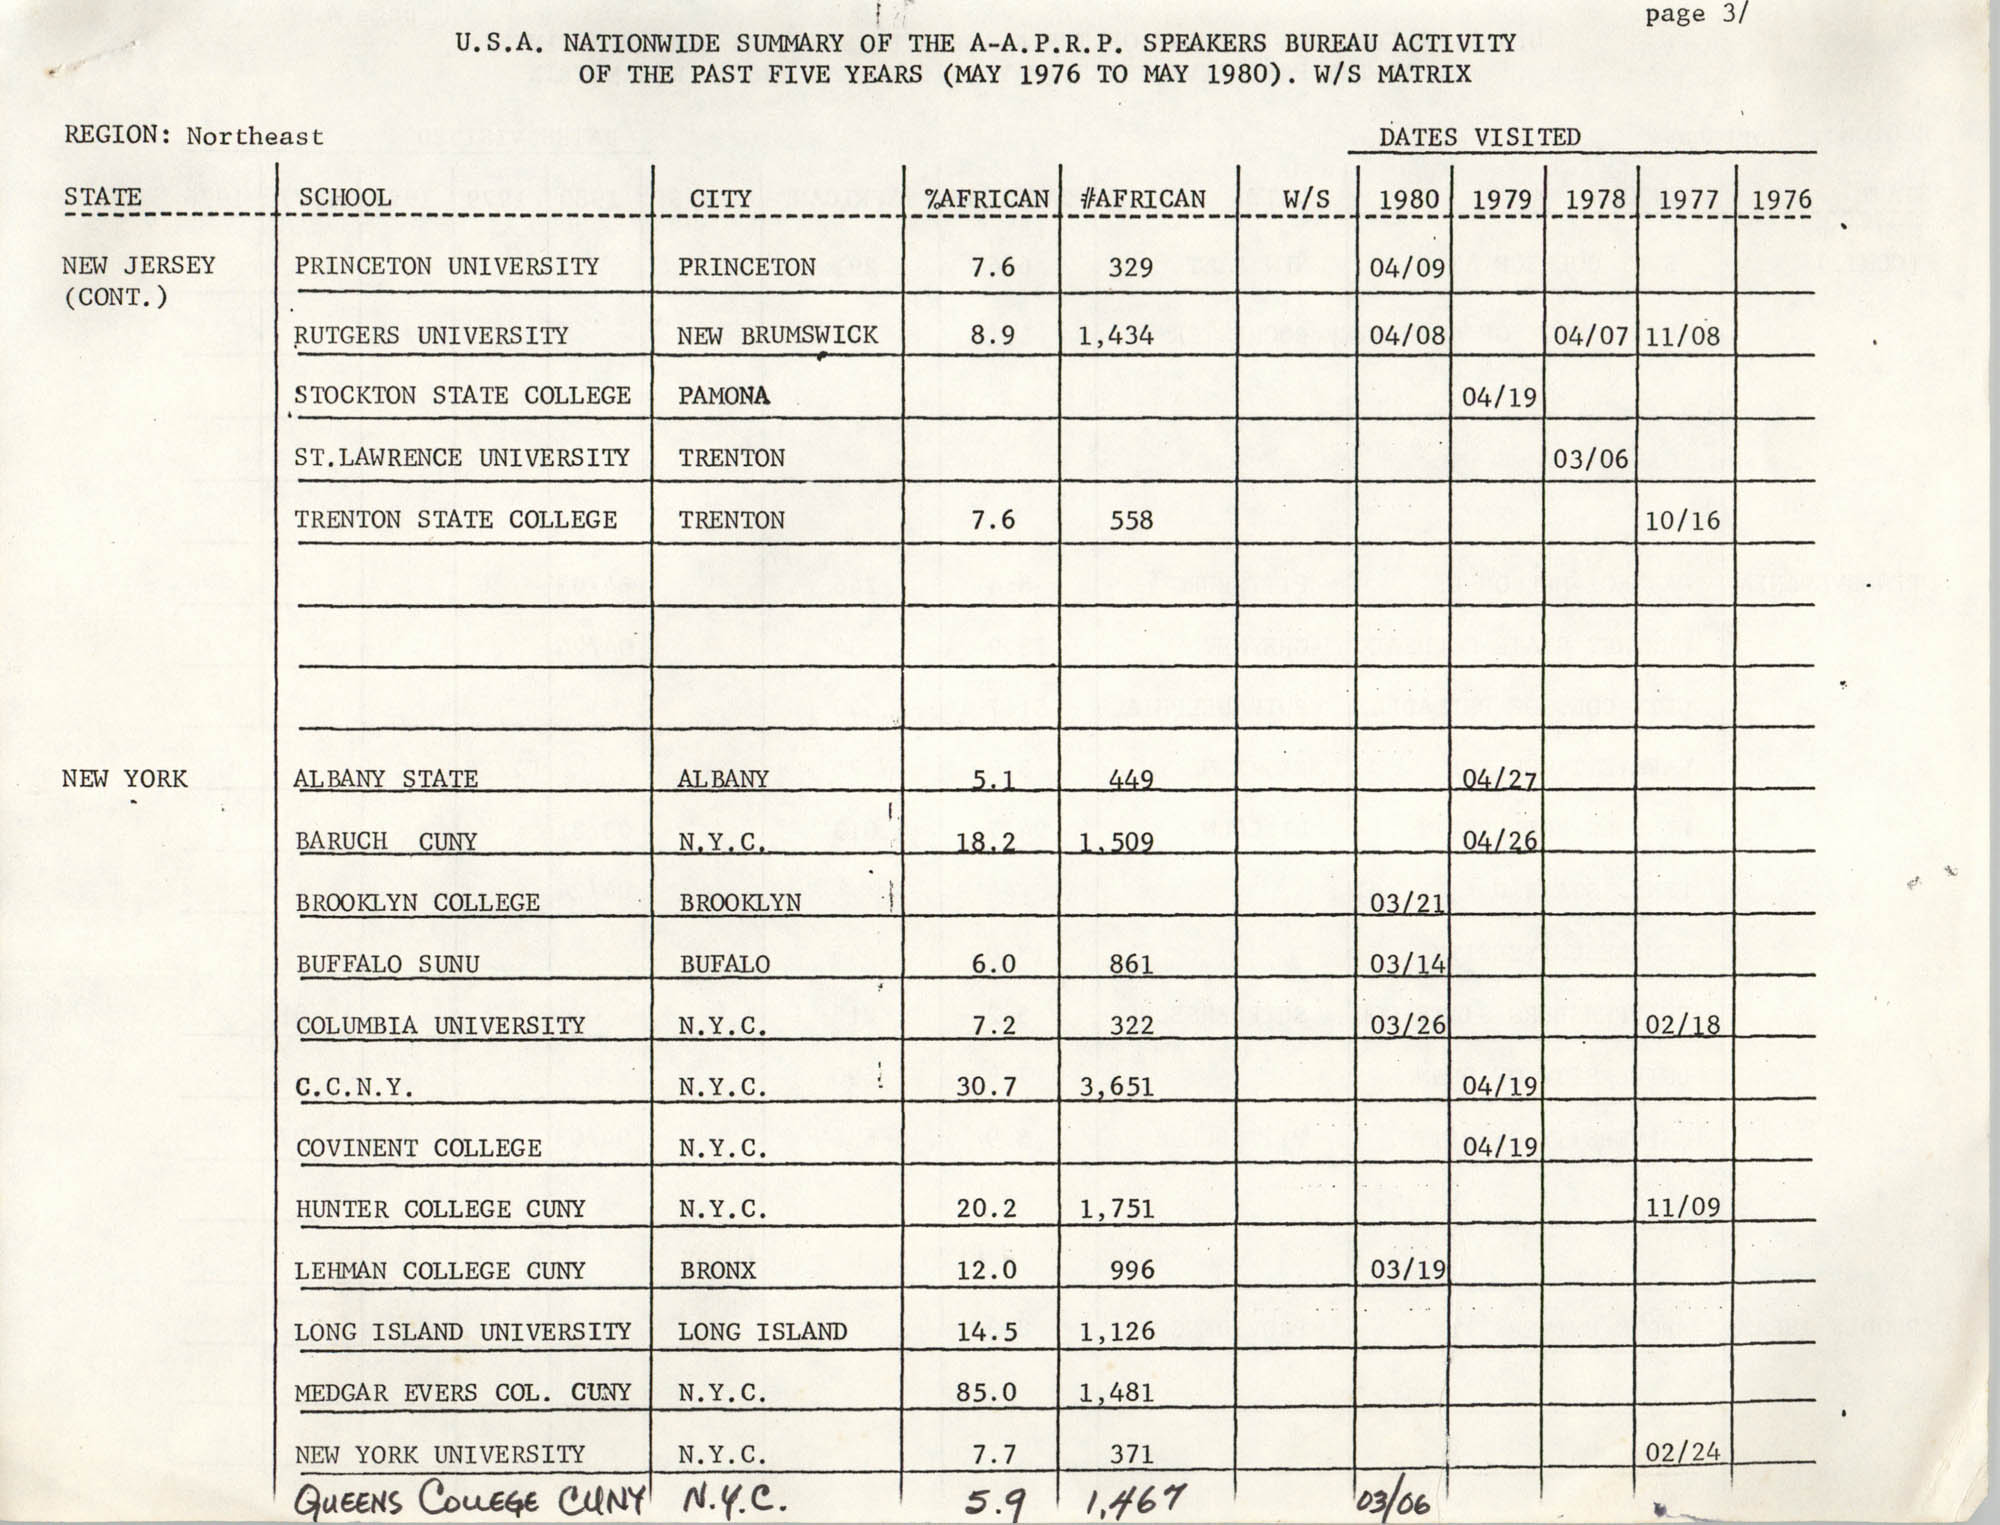 U.S.A. Nationwide Summary, Northeast Region, Page 3